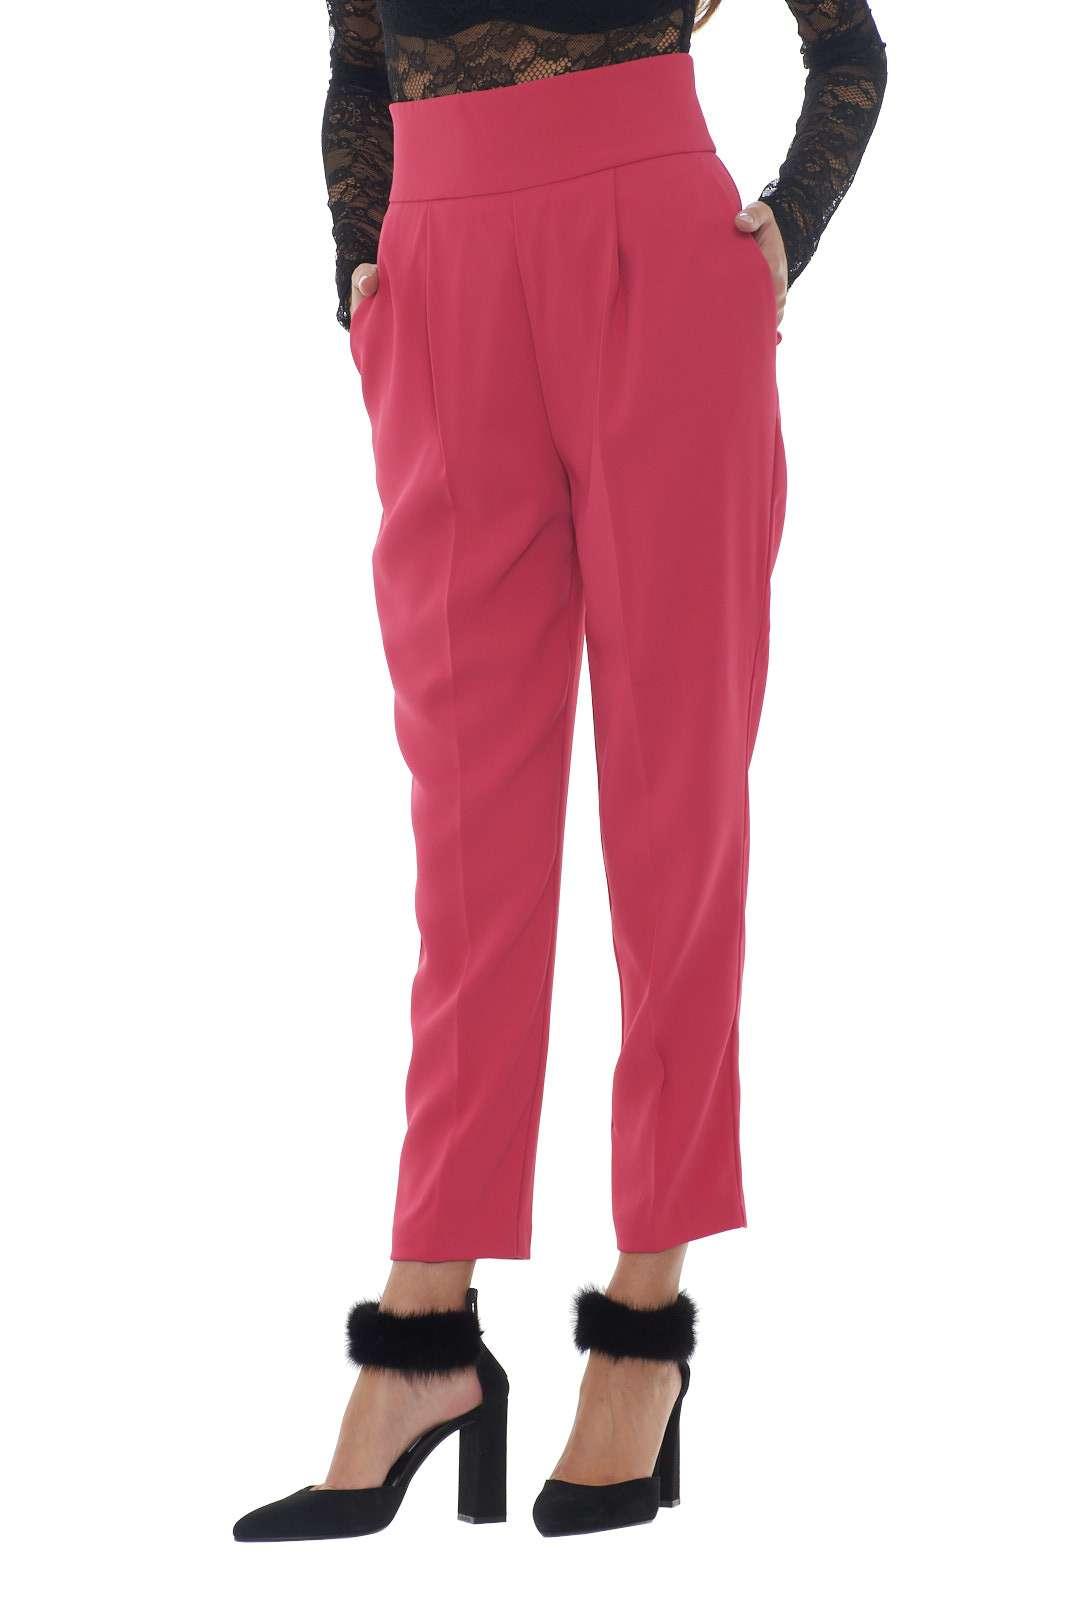 https://www.parmax.com/media/catalog/product/a/i/AI-outlet_parmax-pantaloni-donna-Pinko-1G14C7-A.jpg